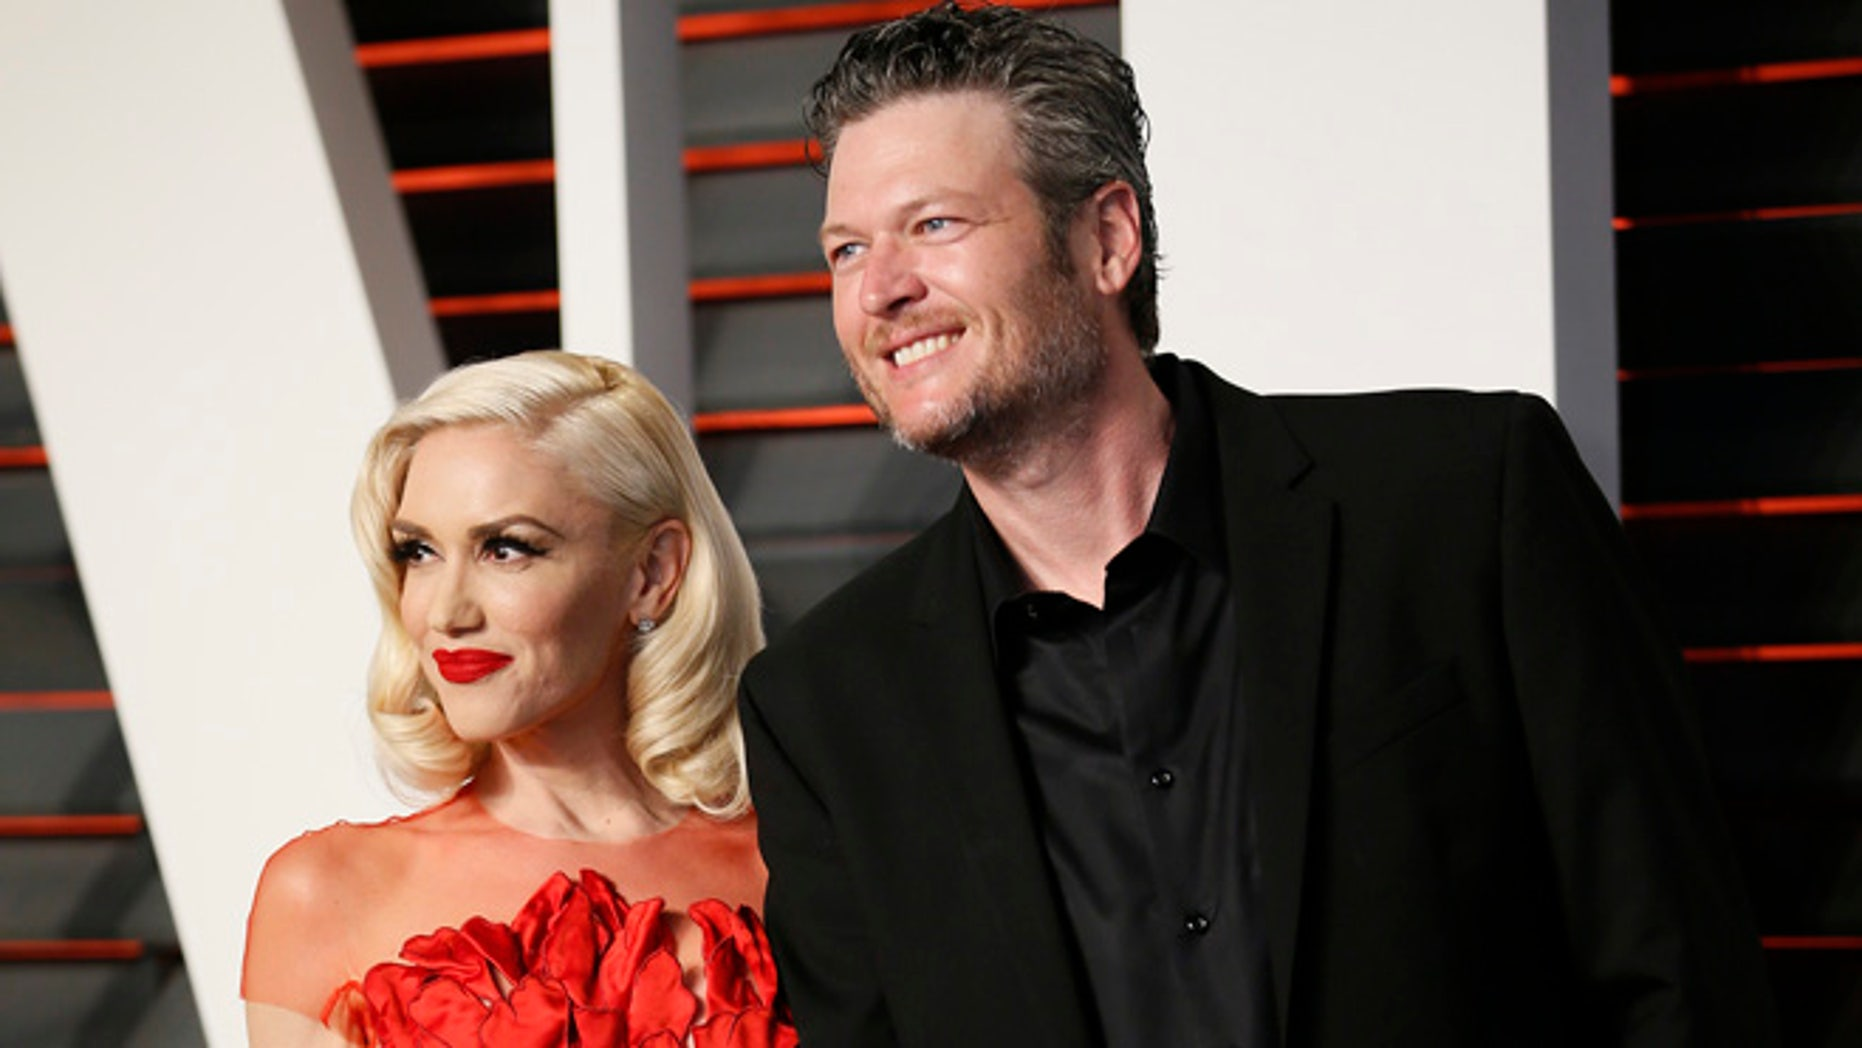 Gwen Stefani and Blake Shelton celebrated Thanksgiving together.